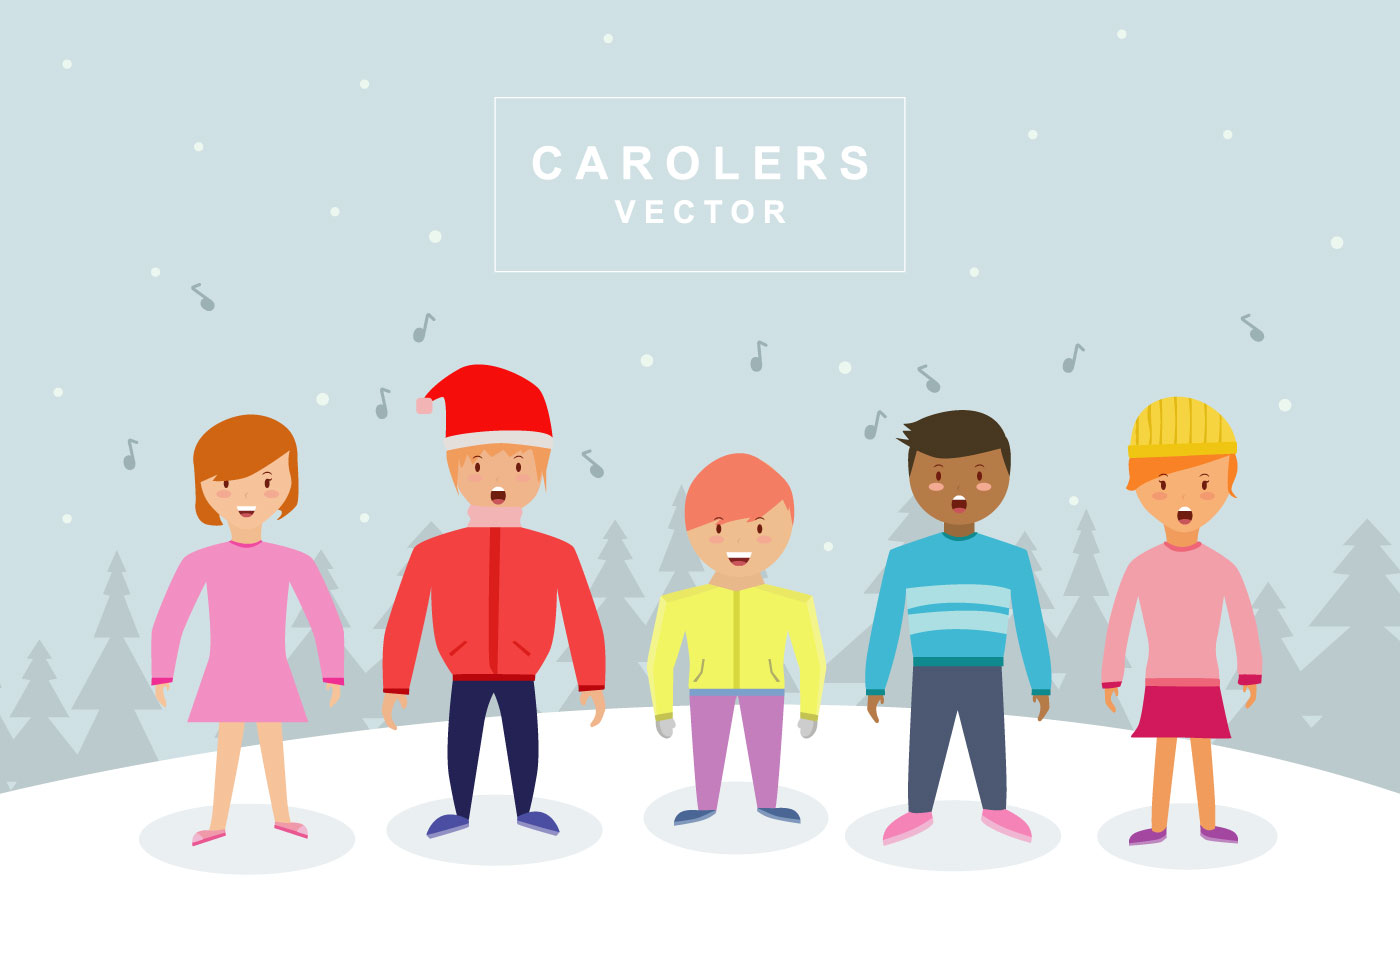 carol singers free vector art